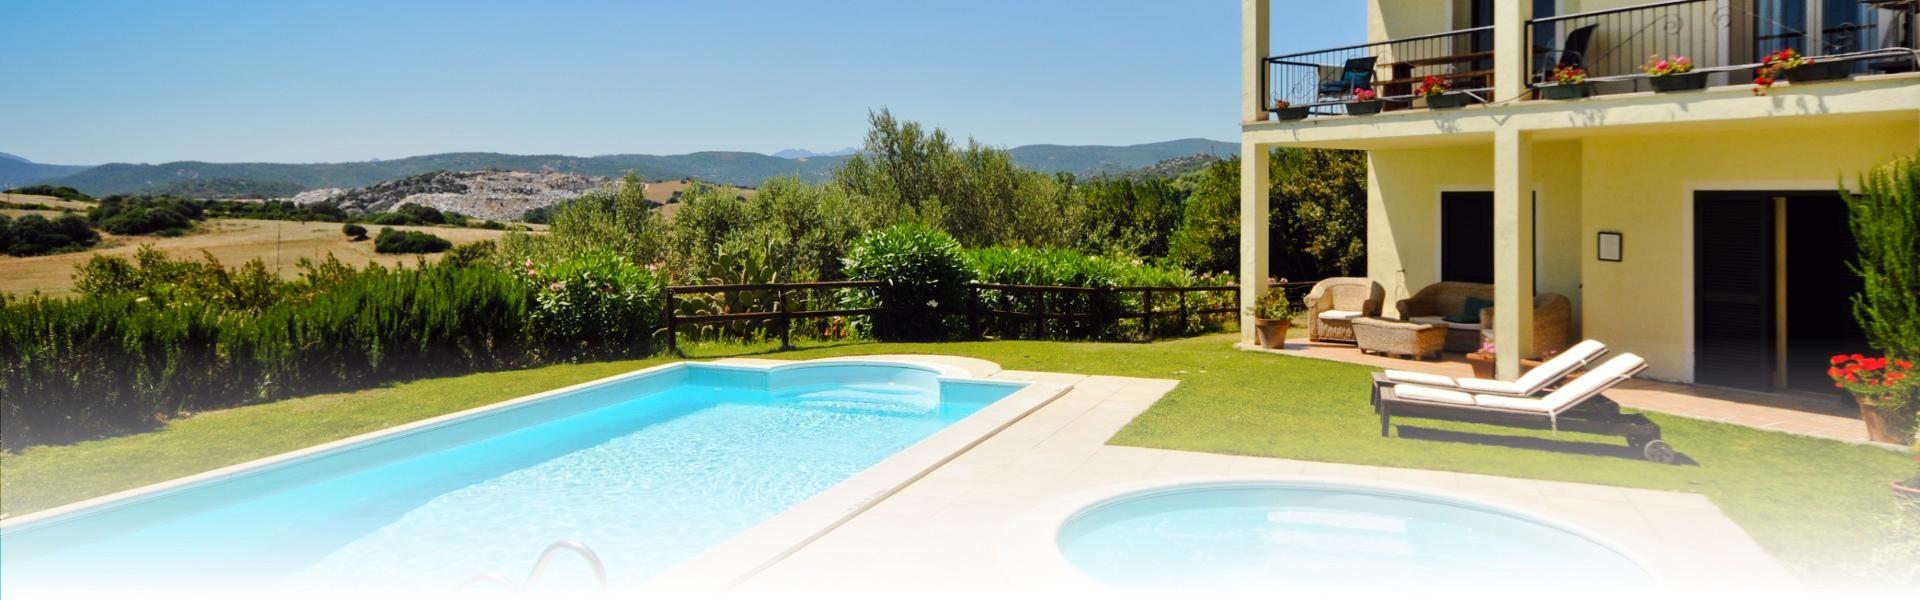 Villas In Sardinia, Sardinia Villas, Villas In North East Sardinia, Villas  In North West Sardinia, Villas In Central Sardinia, Villas In South Sardinia,  ...